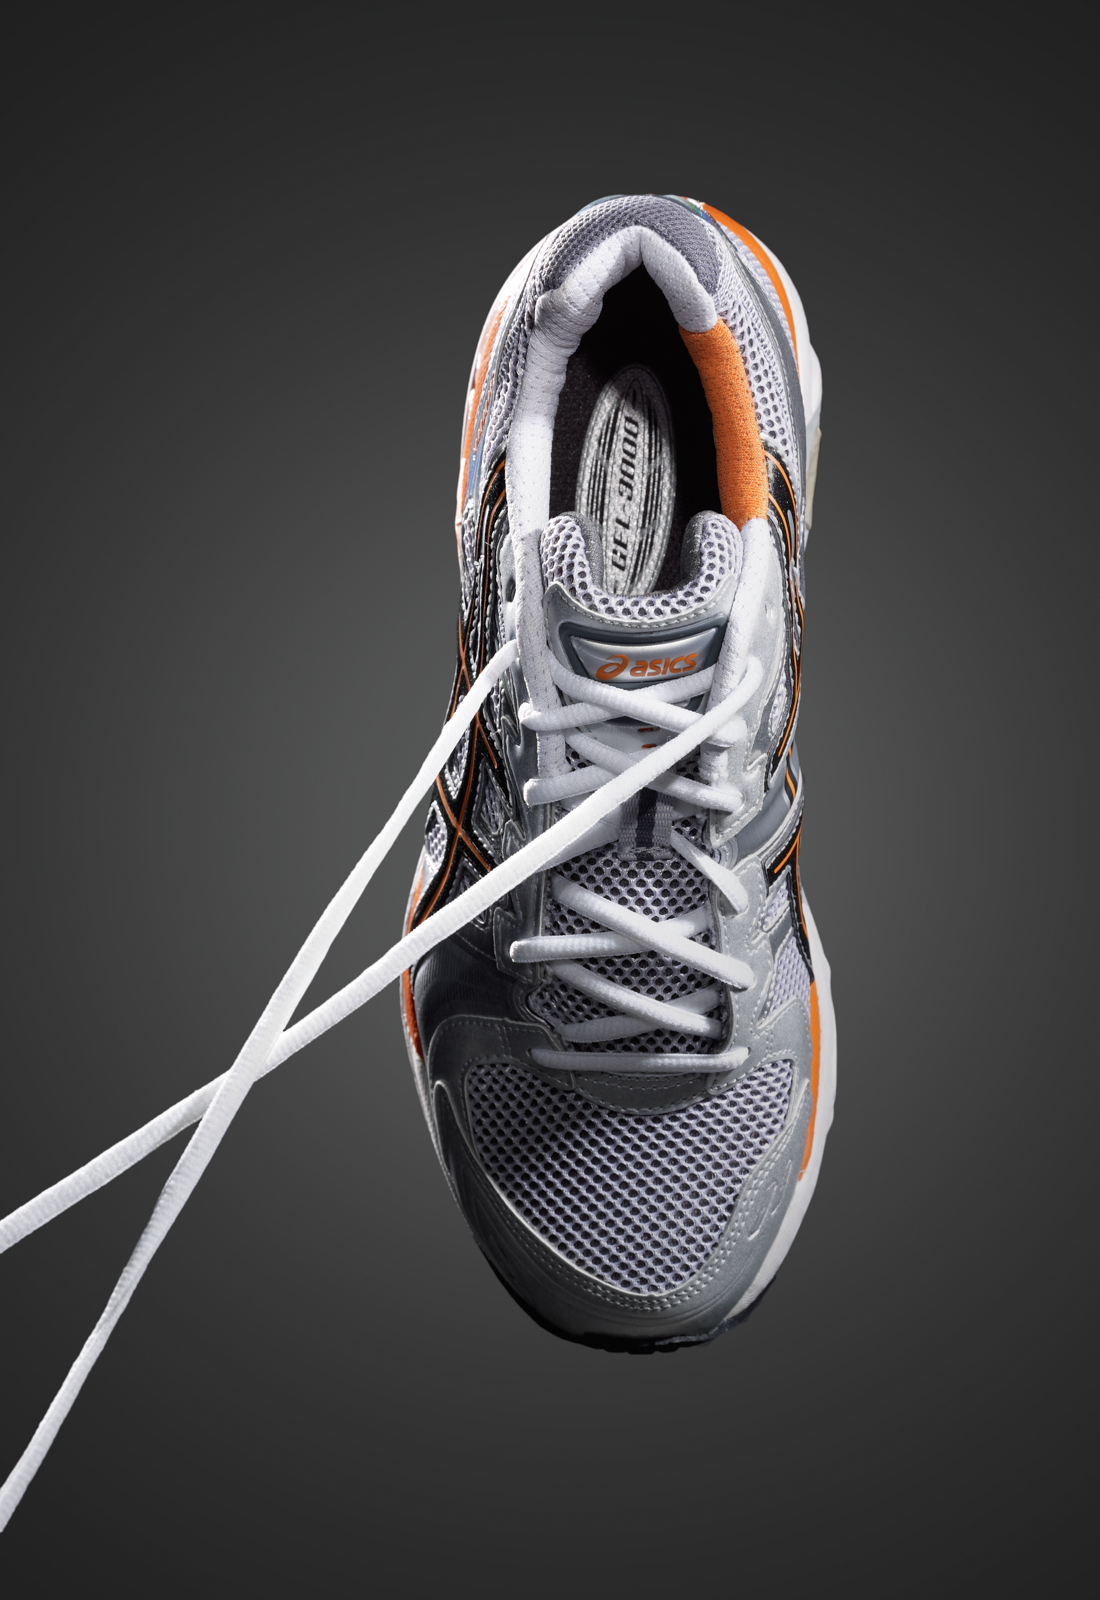 shoes_003.jpg